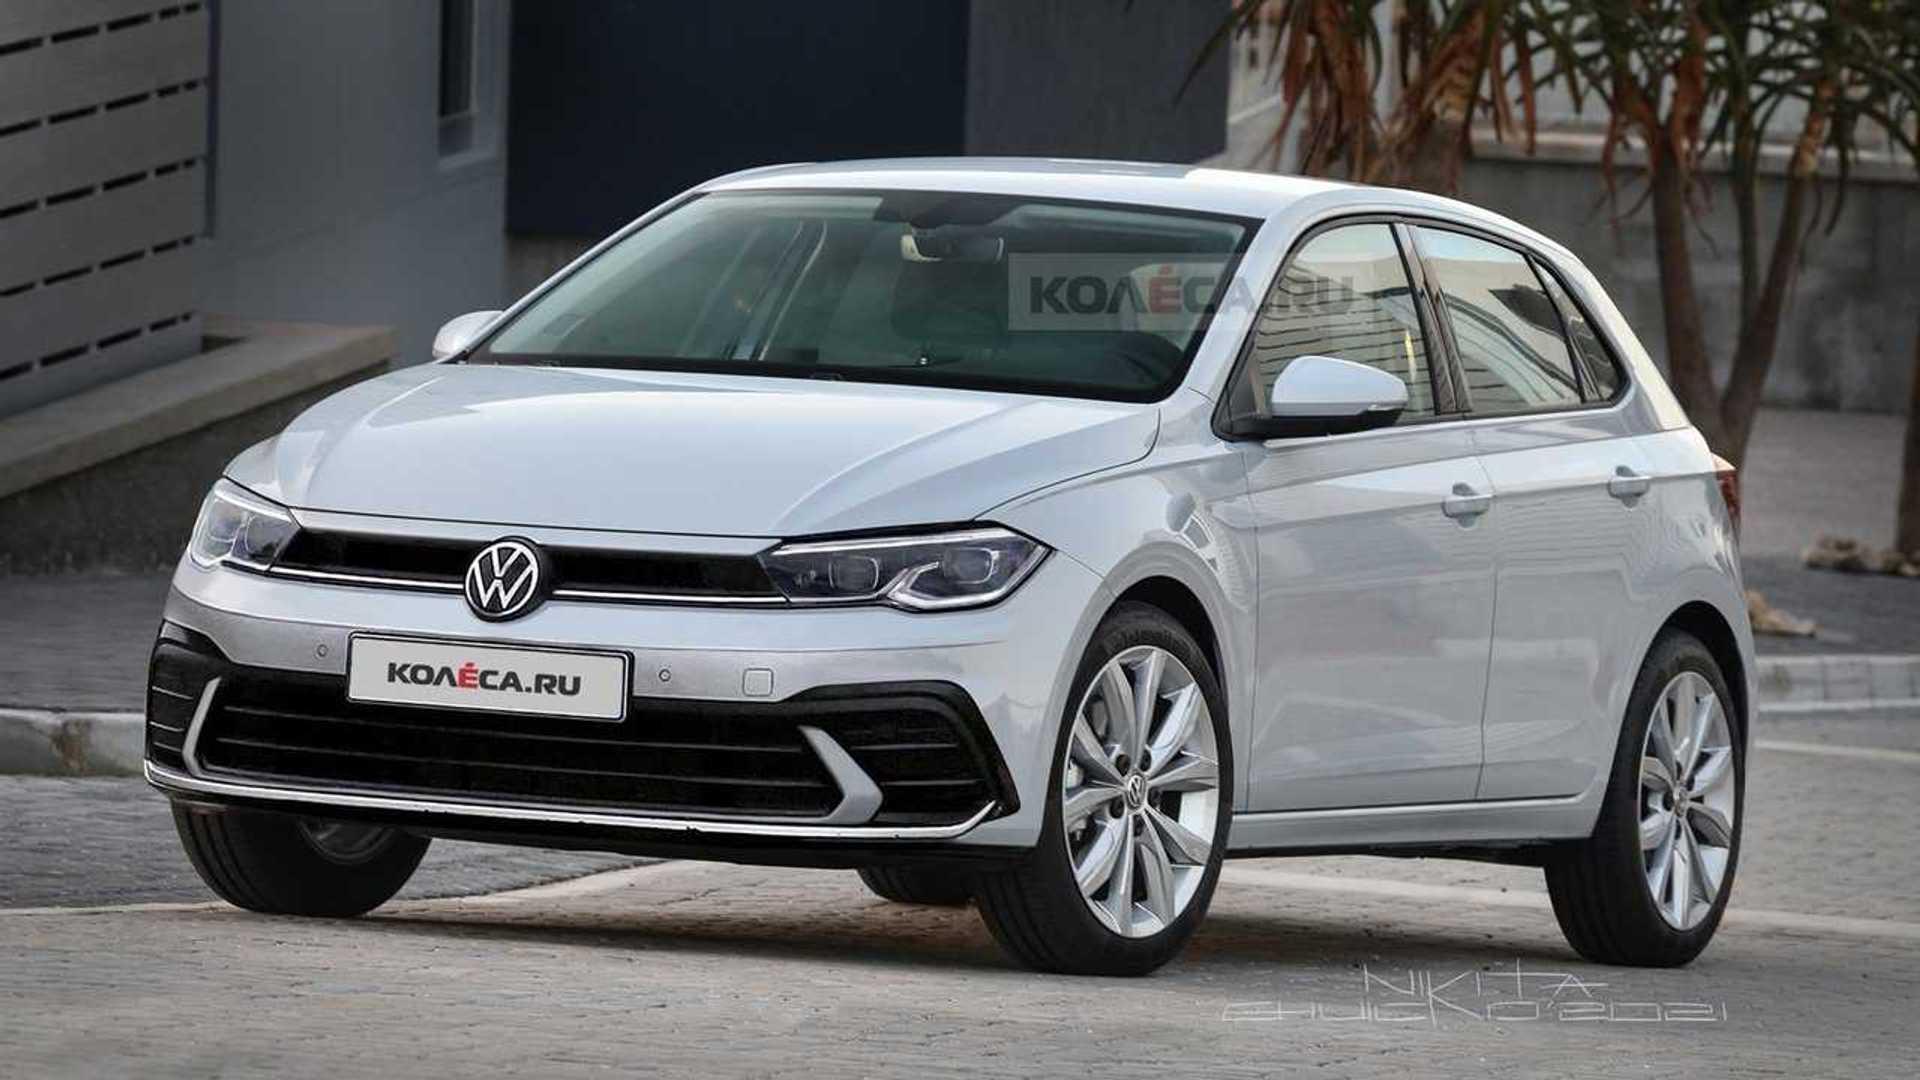 Рестайлинг VW Polo 2021 года спекулятивно сделан на основе шпионских снимков